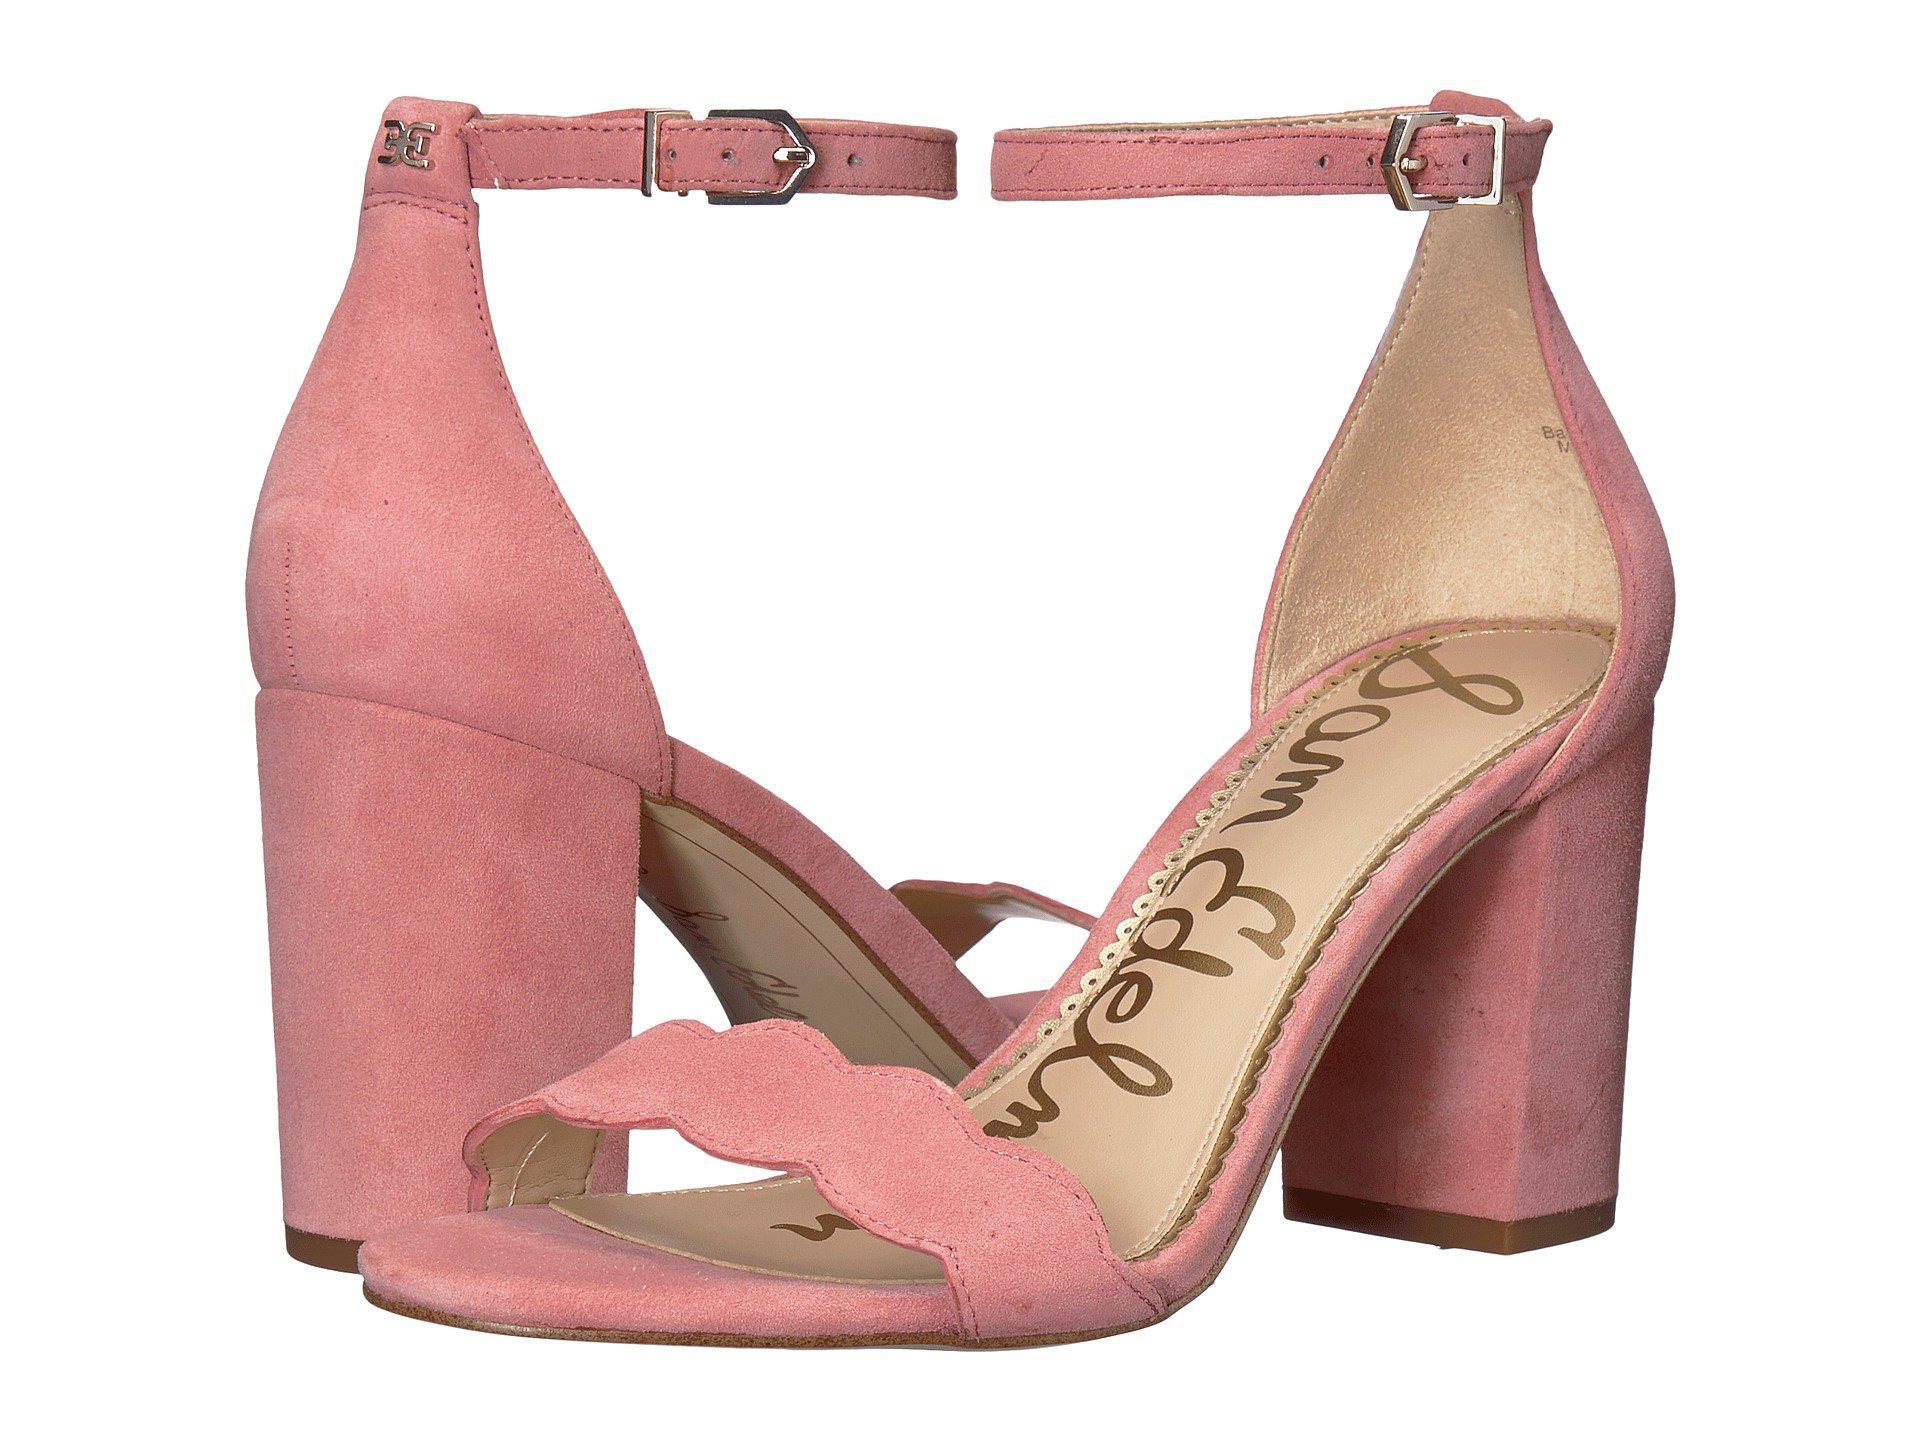 550f56caa6ff38 Lyst - Sam Edelman Odila Ankle Strap Sandal Heel in Pink - Save 35%